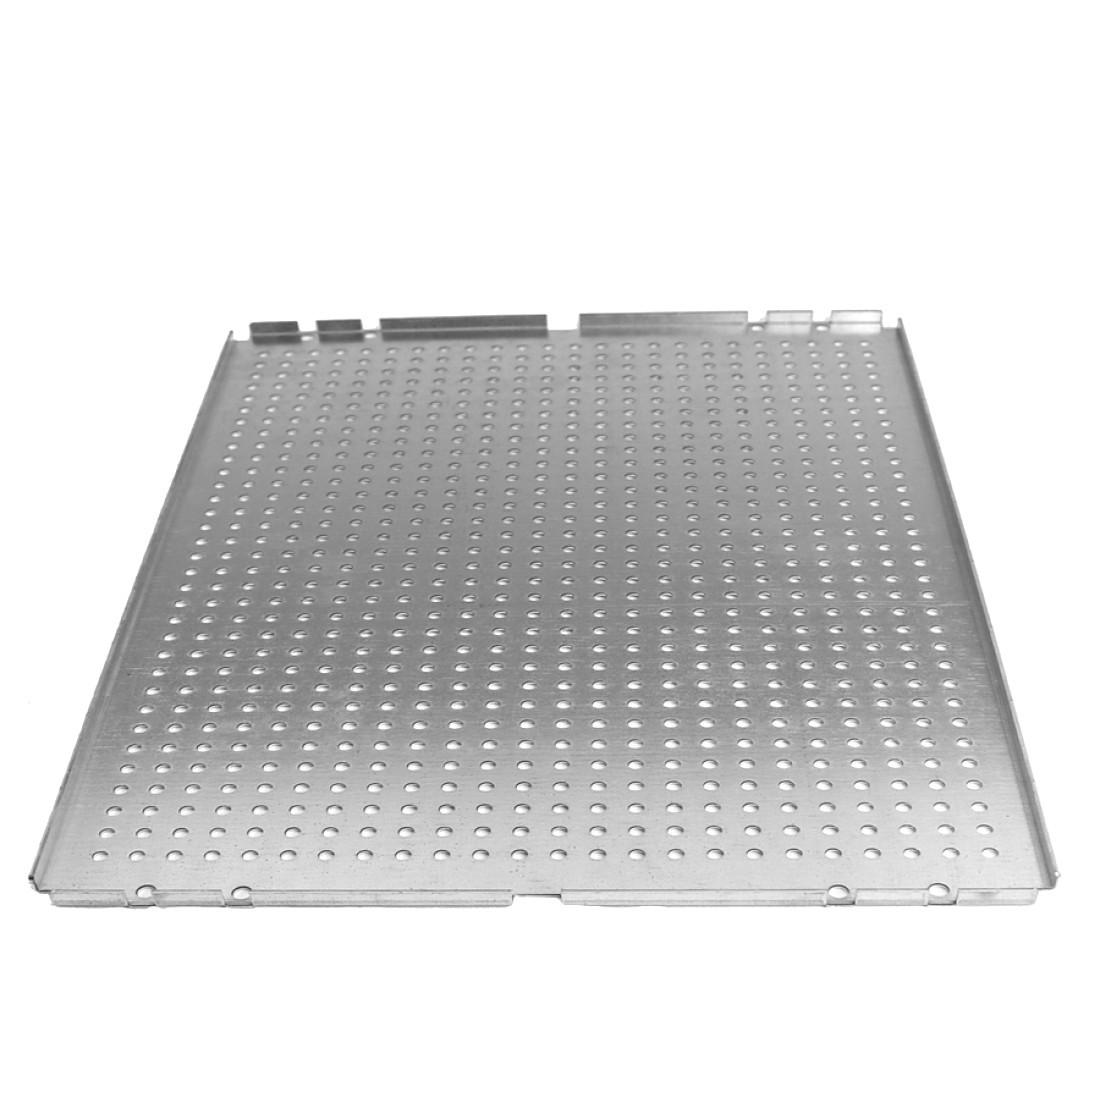 HIFI 2000 Inner baseplate 360x260mm (300mm Series)